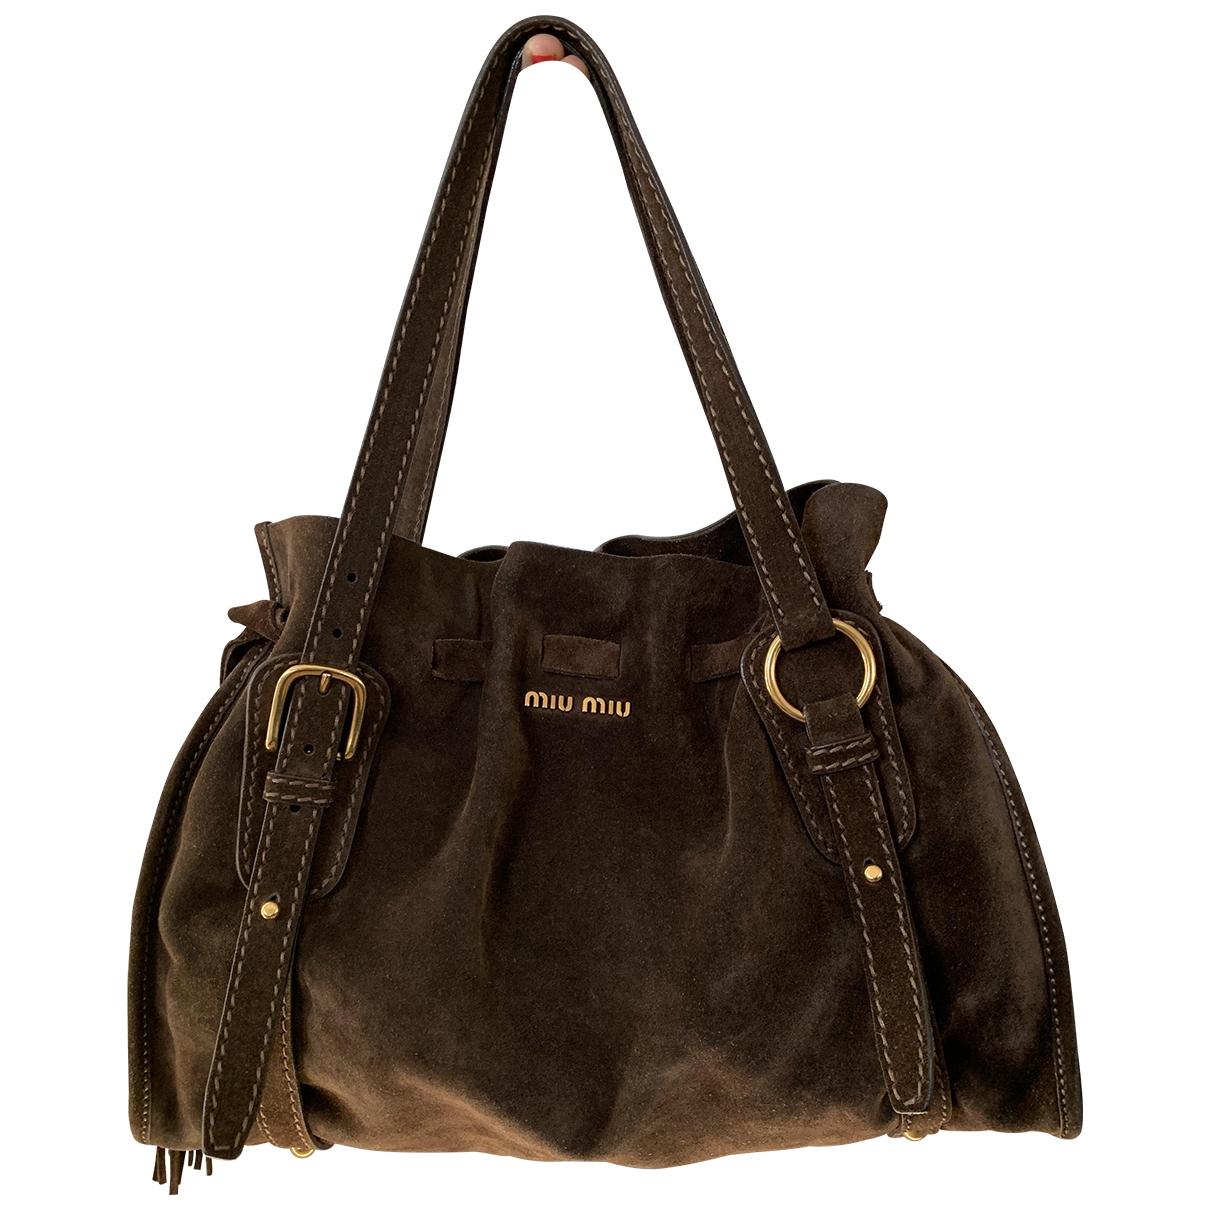 Miu Miu \N Handtasche in  Braun Veloursleder